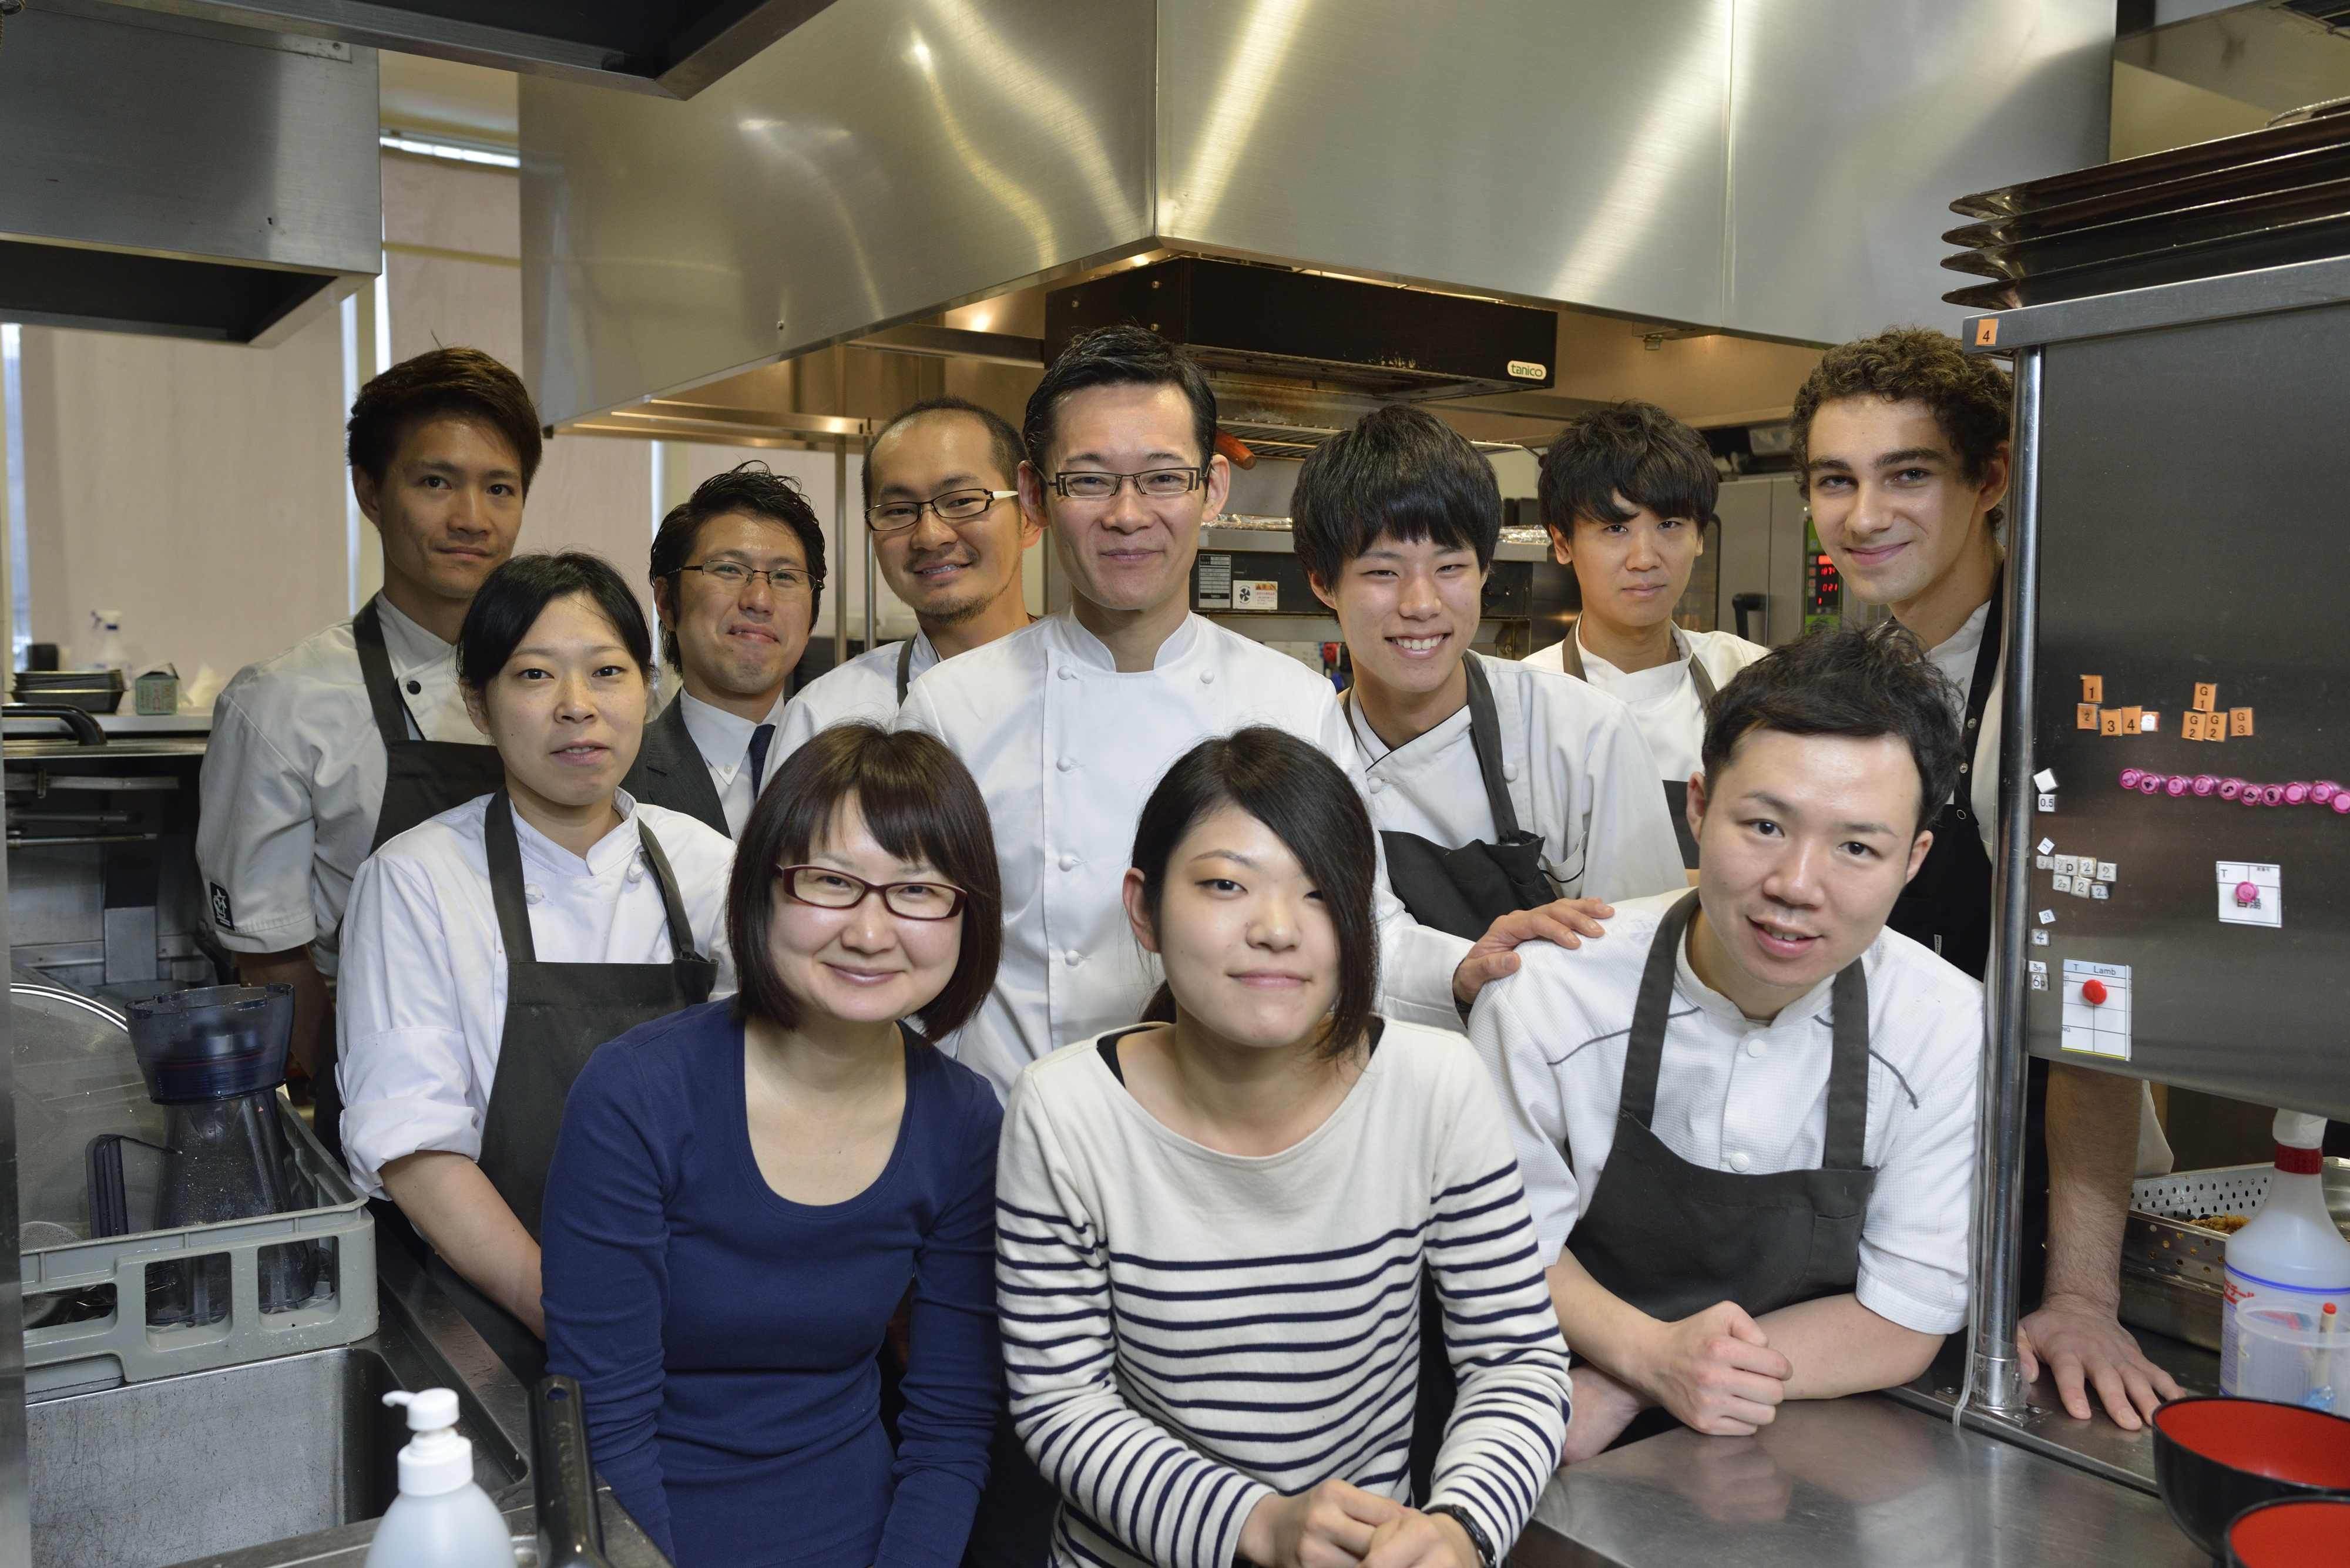 Restaurant HAJIME Hajime Yoneda & staff